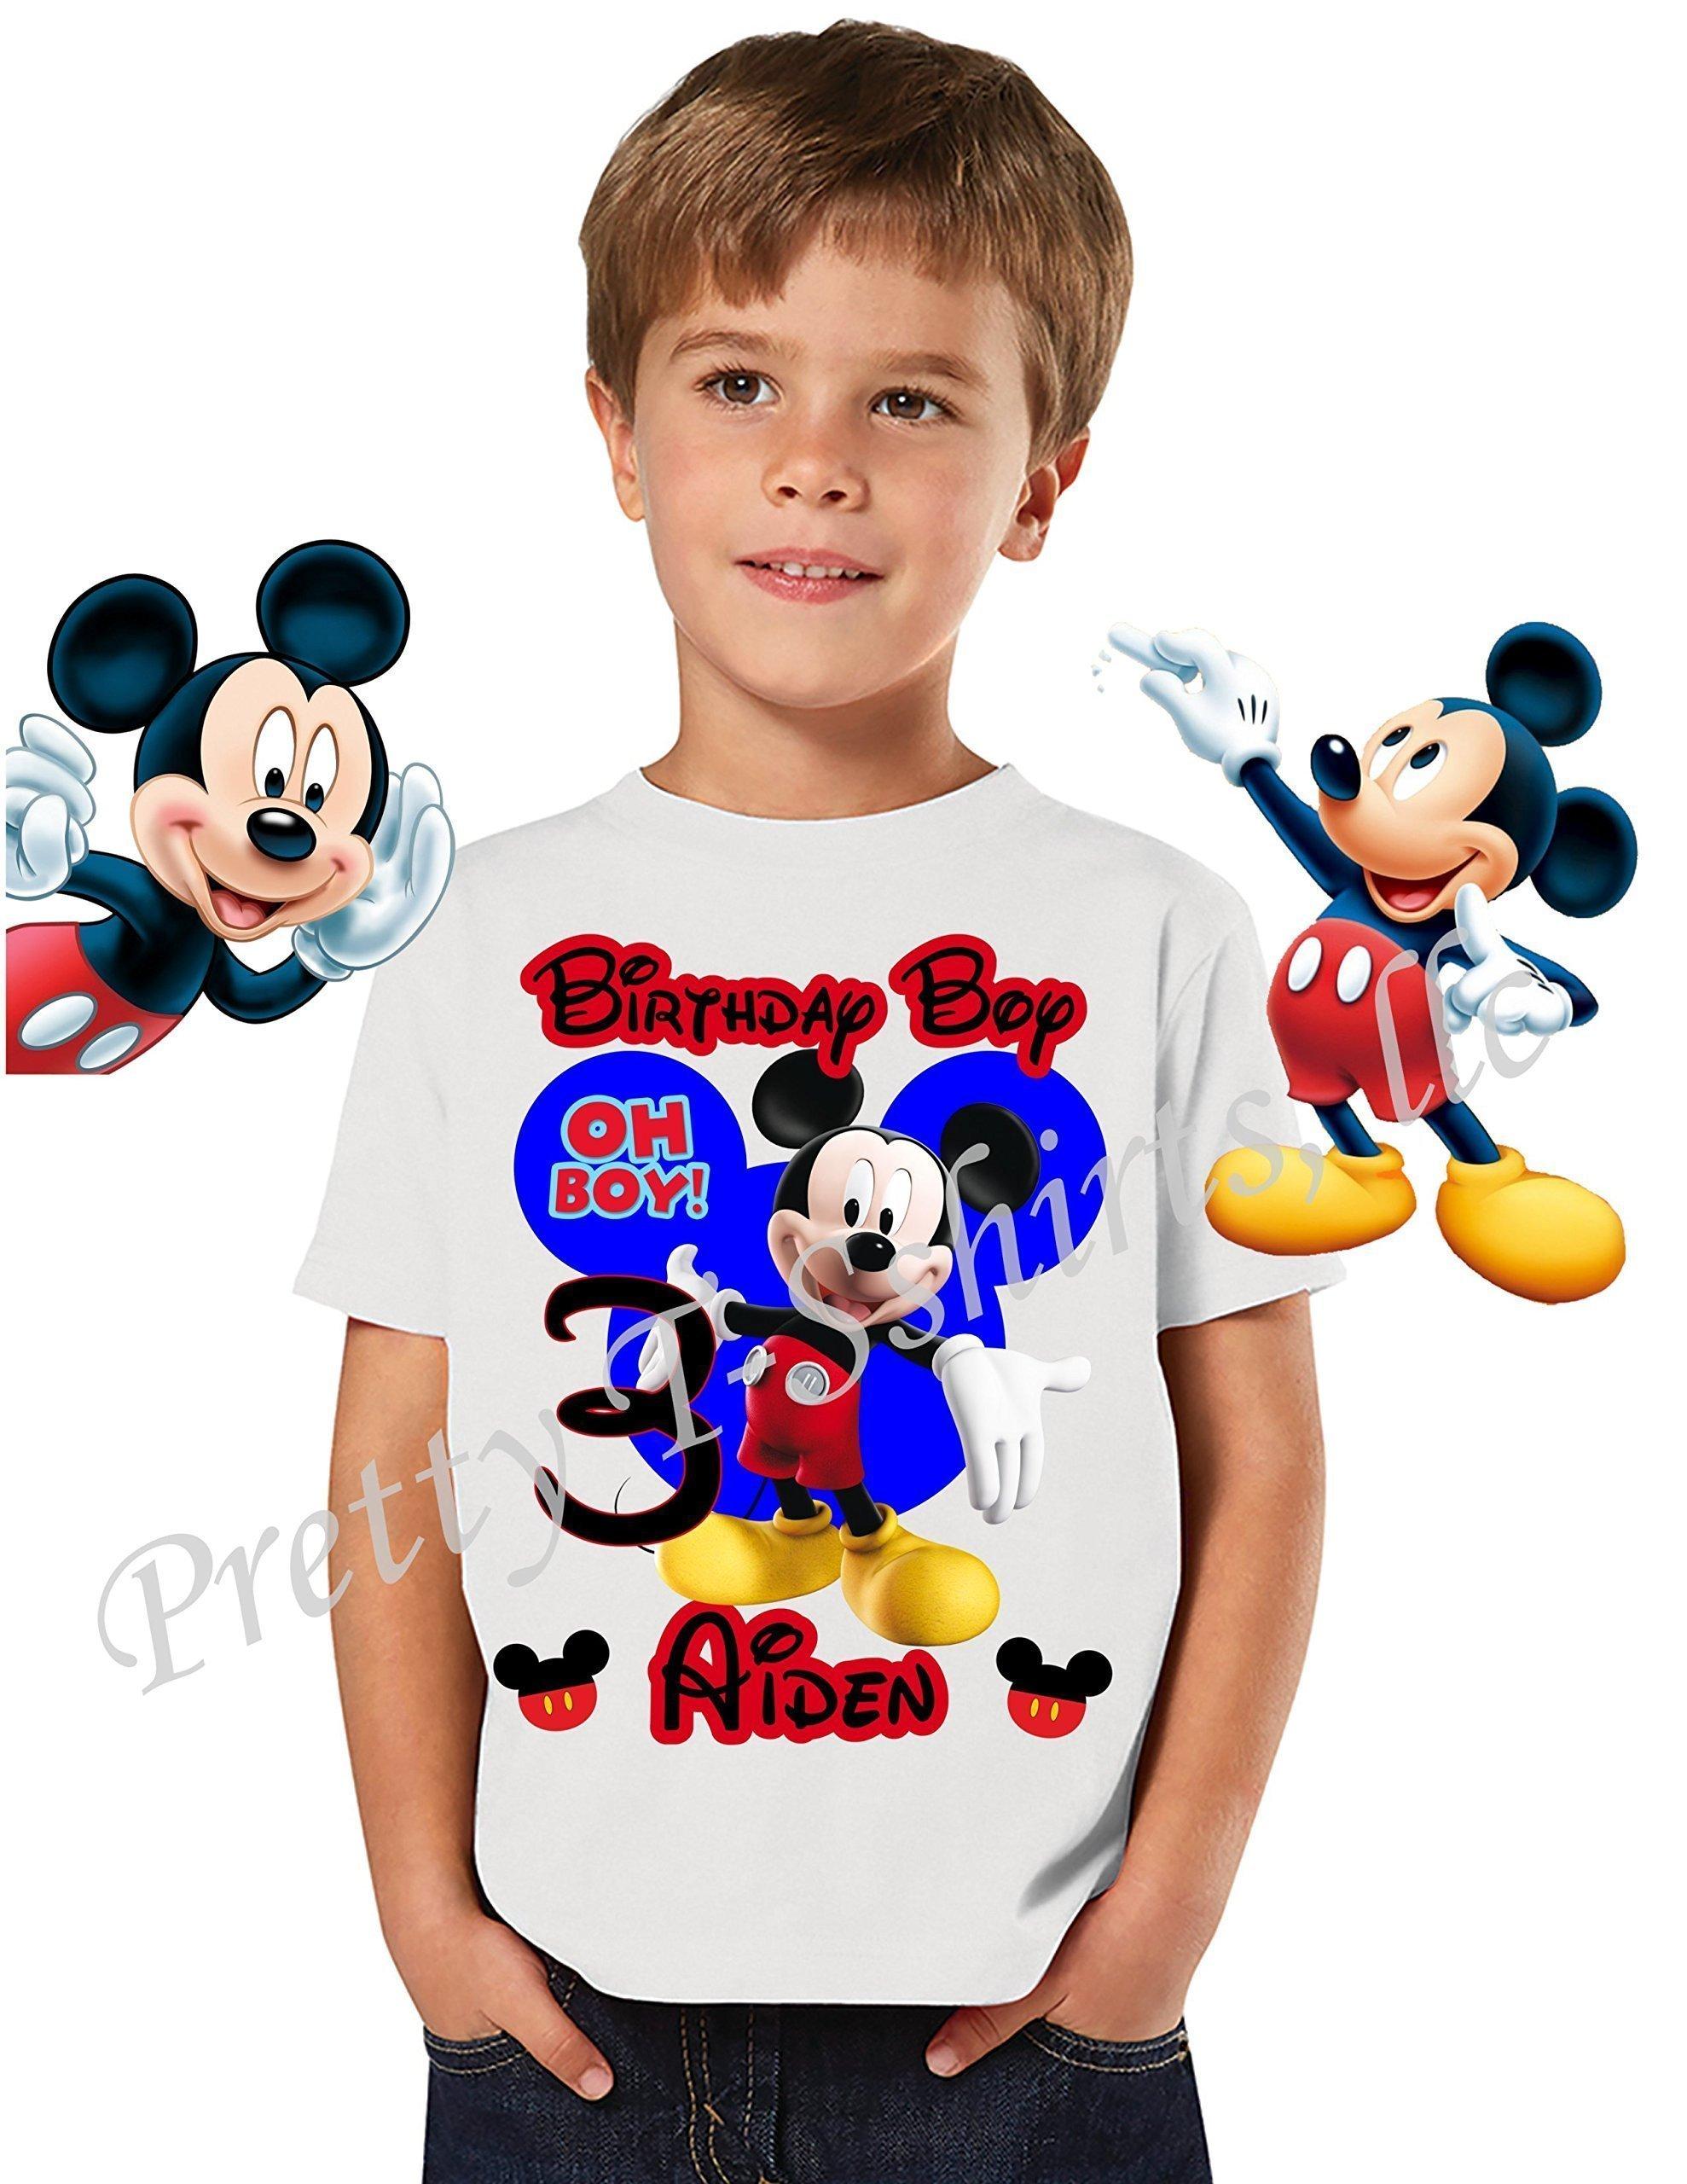 Mickey Birthday Shirt, ADD any name & age, Birthday Boy Shirt, Disney FAMILY Matching Shirts, Mickey Mouse Shirt, OOH BOY, VISIT OUR SHOP!!!